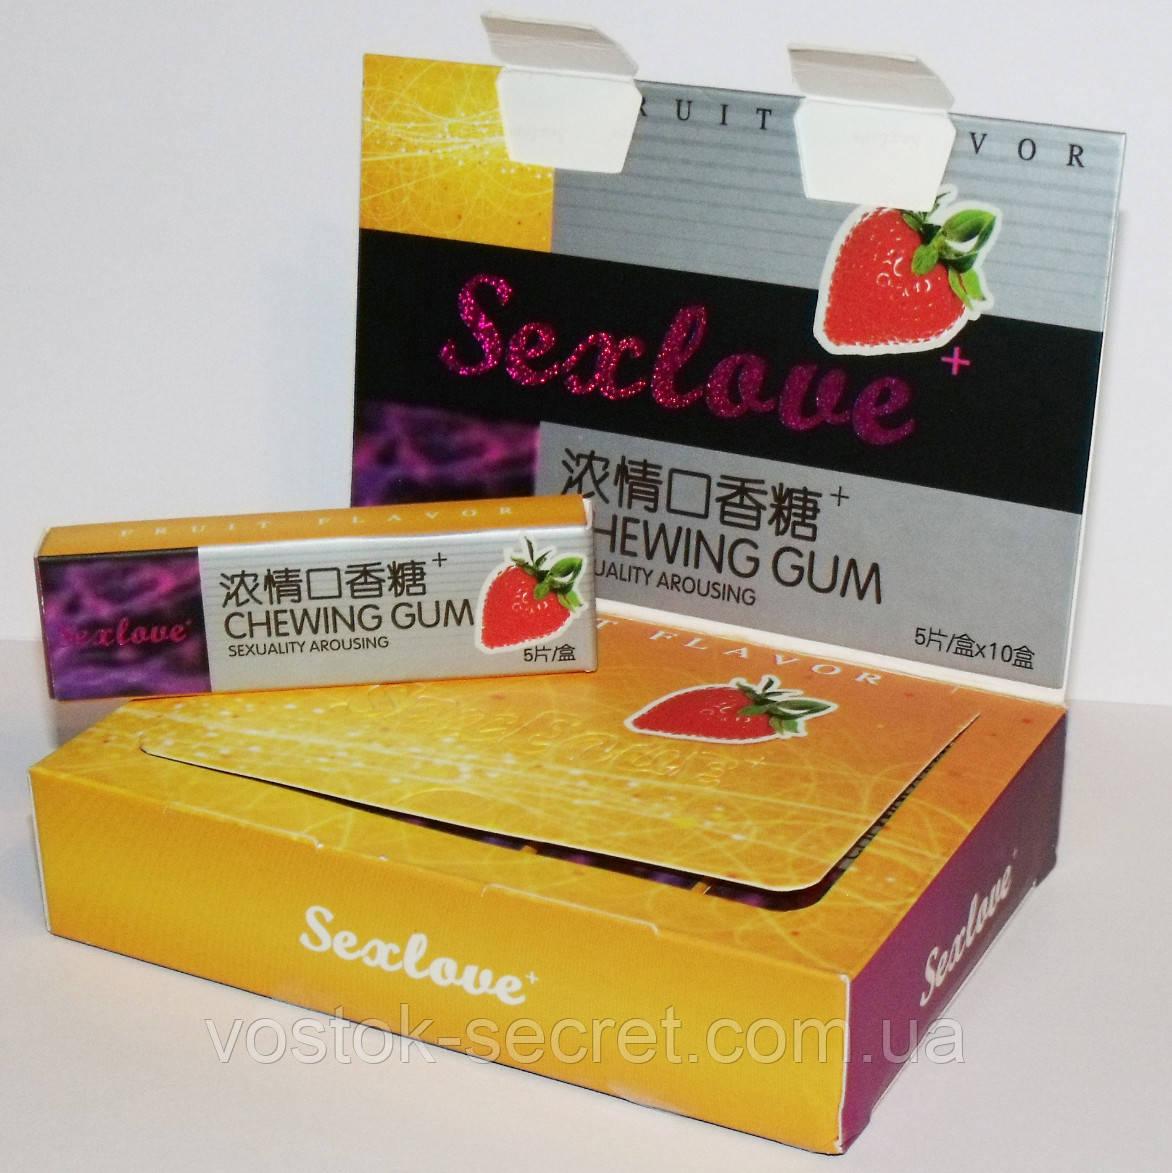 Жвачка для секса sex guns